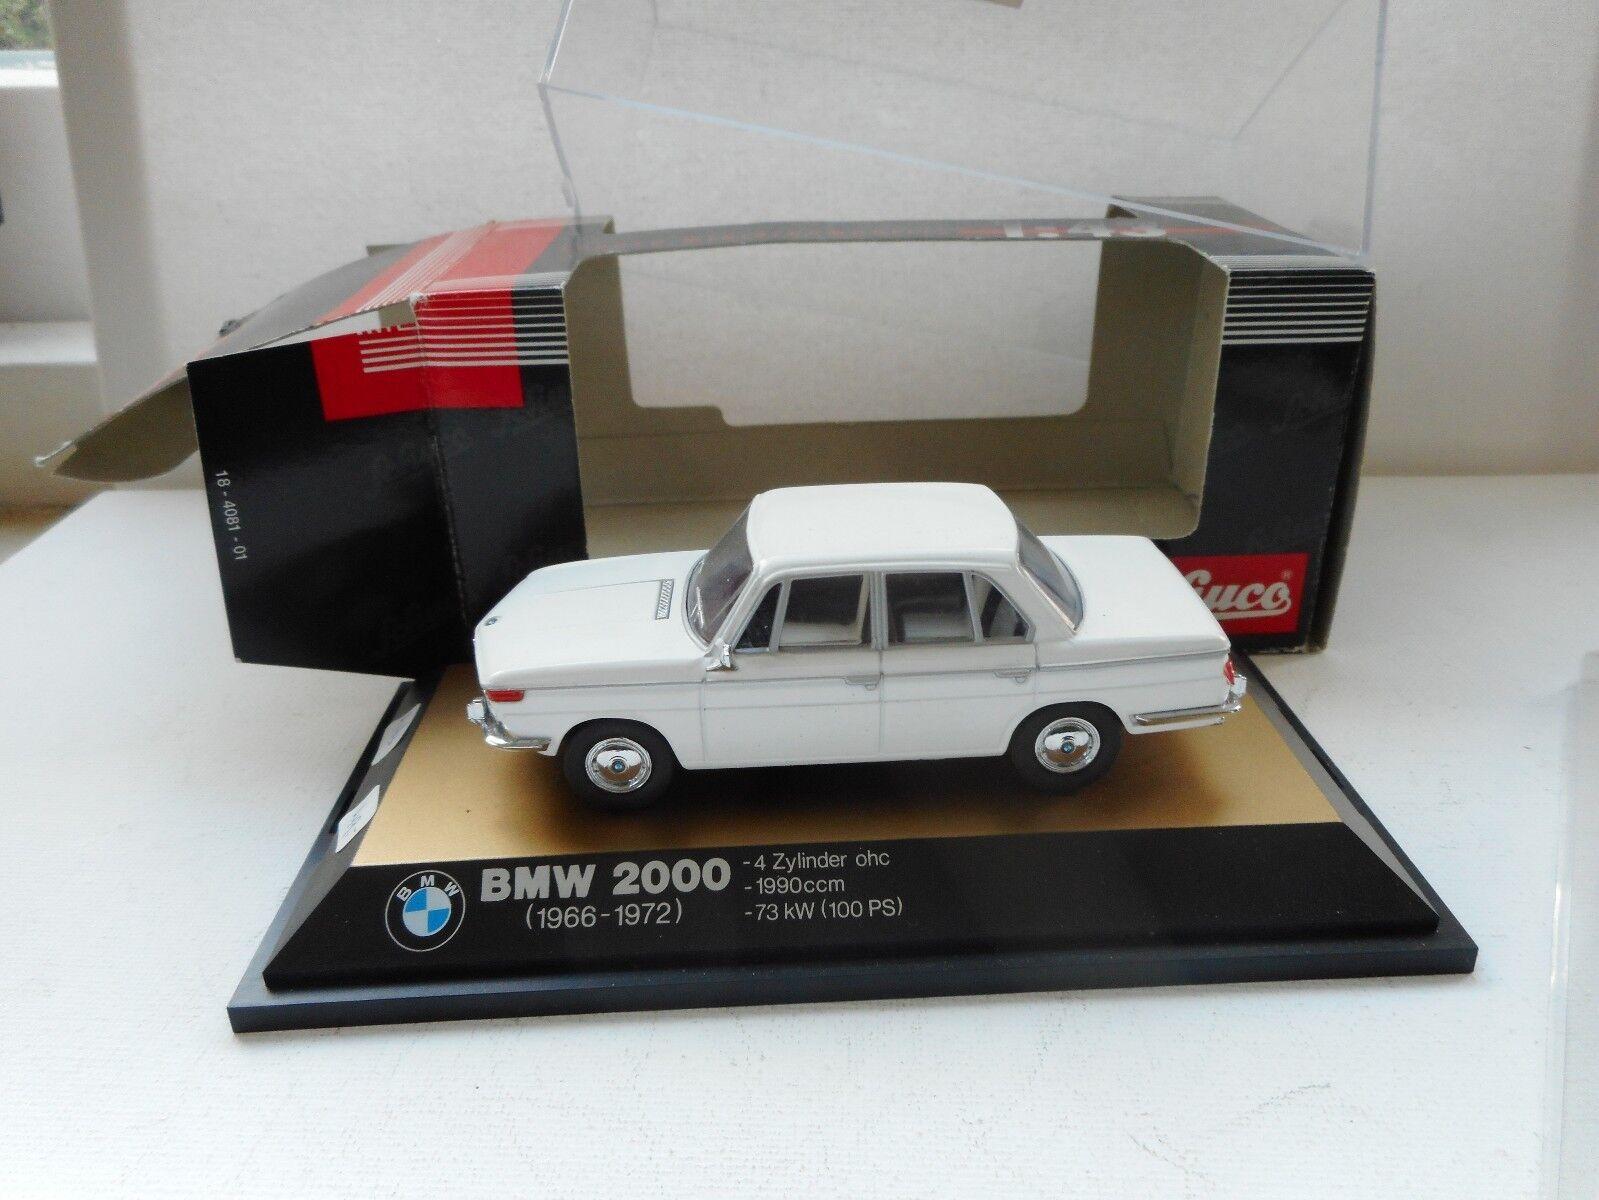 Schuco BMW 2000 021635  Nice Beige  (1966-1972)    1 43 scale diecast M boxed 66e19c